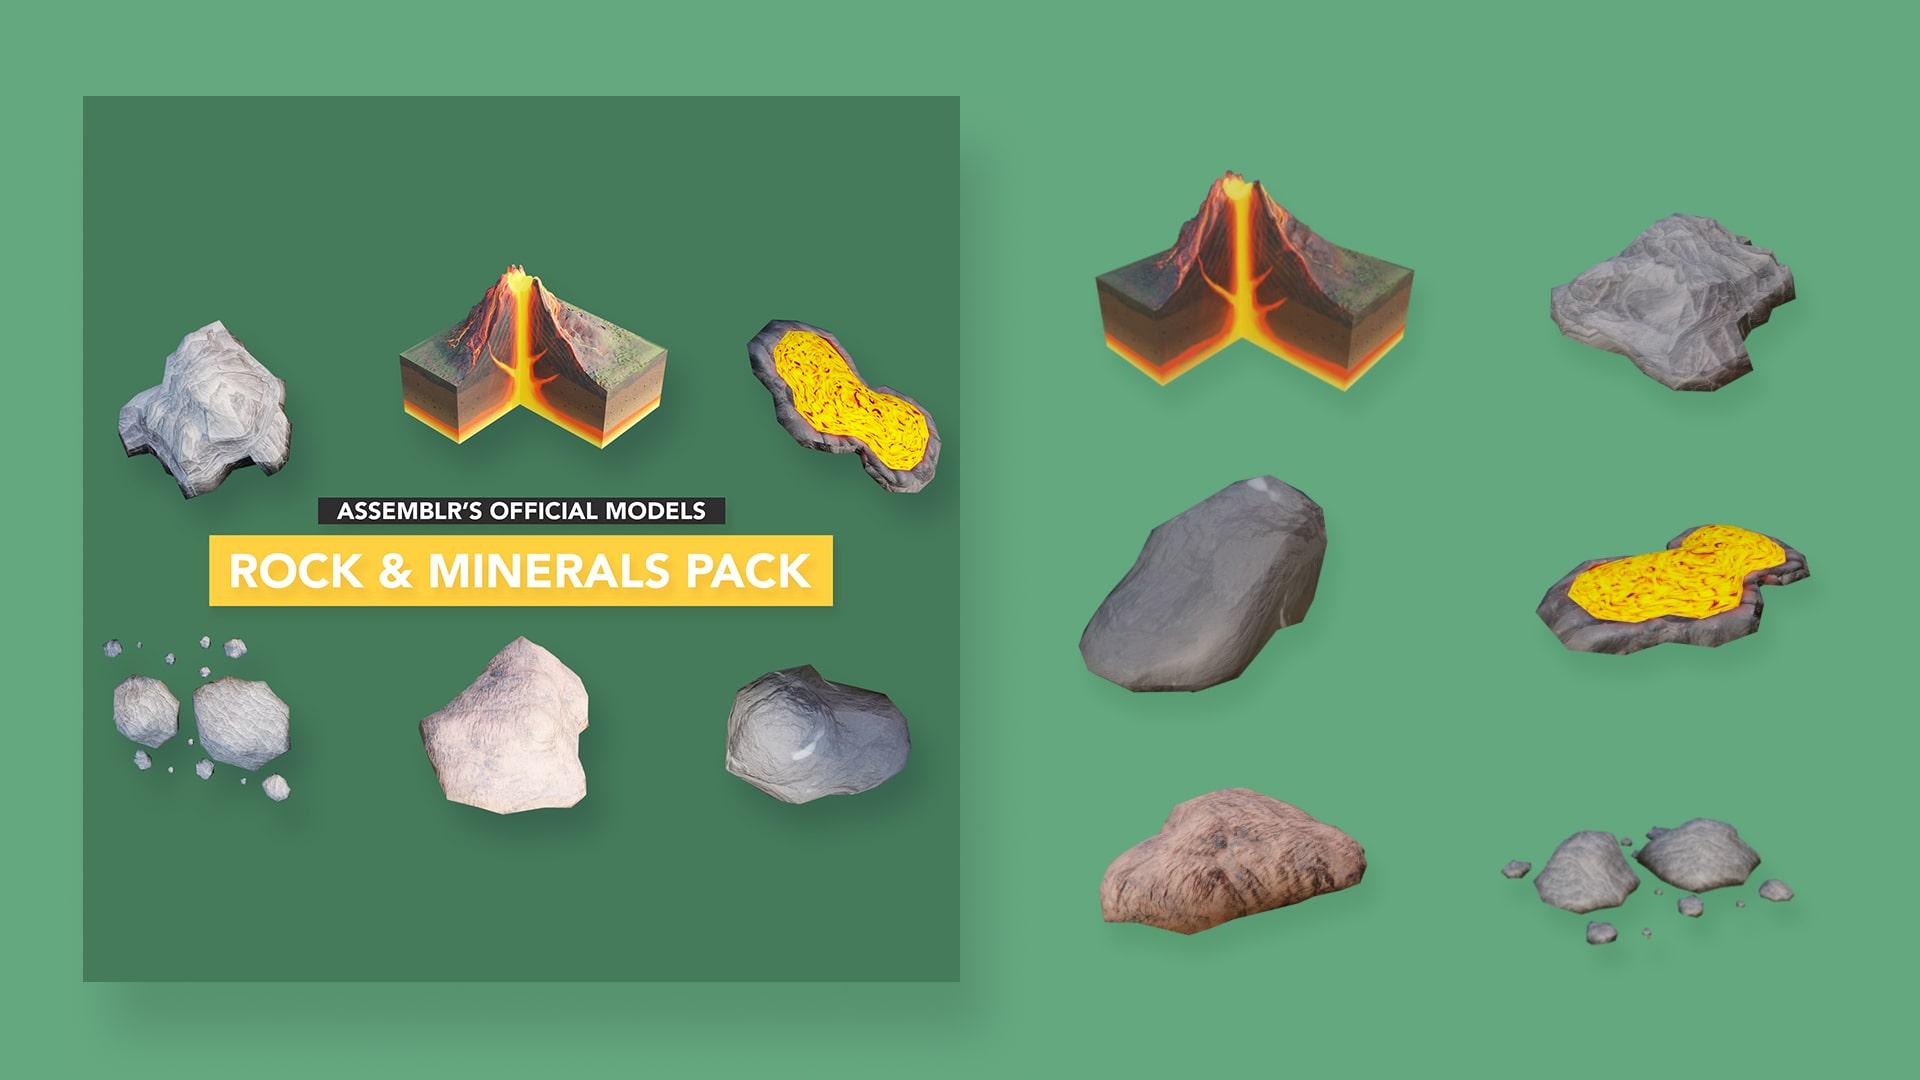 Rock & minerals pack #1